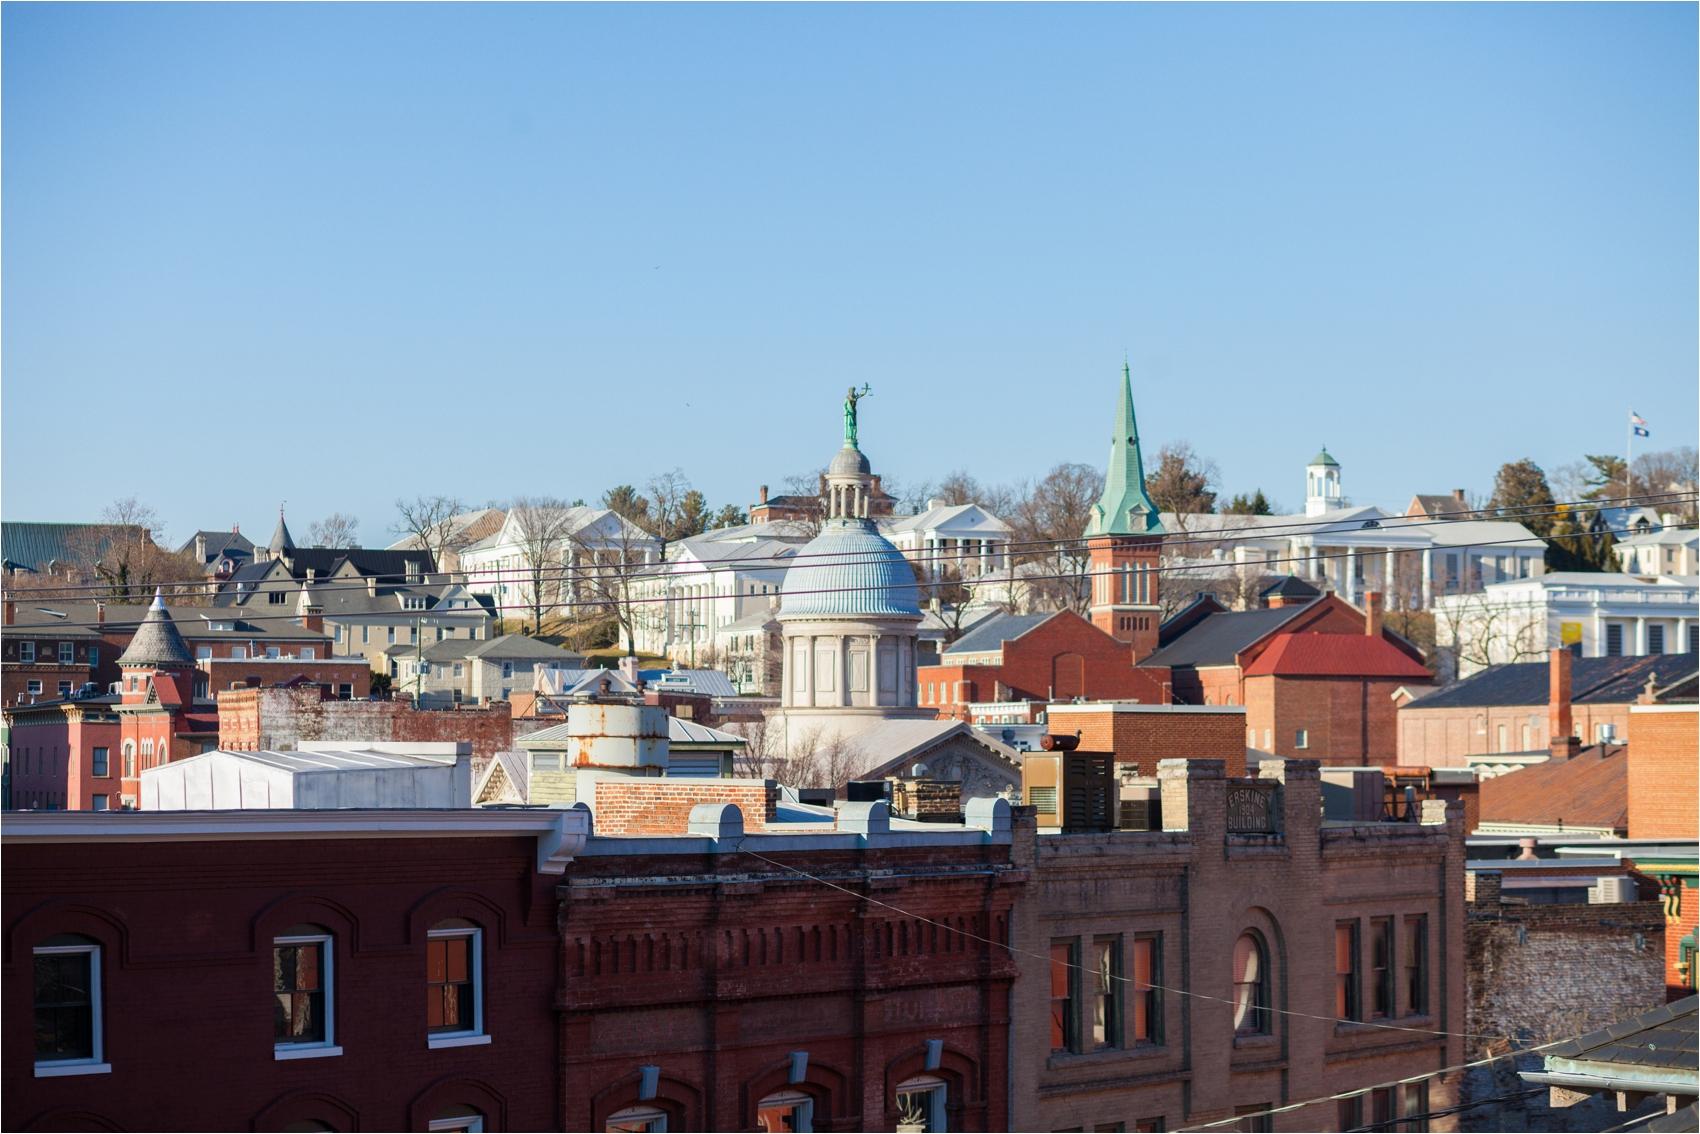 Downtown-Staunton-VA-Spring-Engagement-Session-2910.jpg